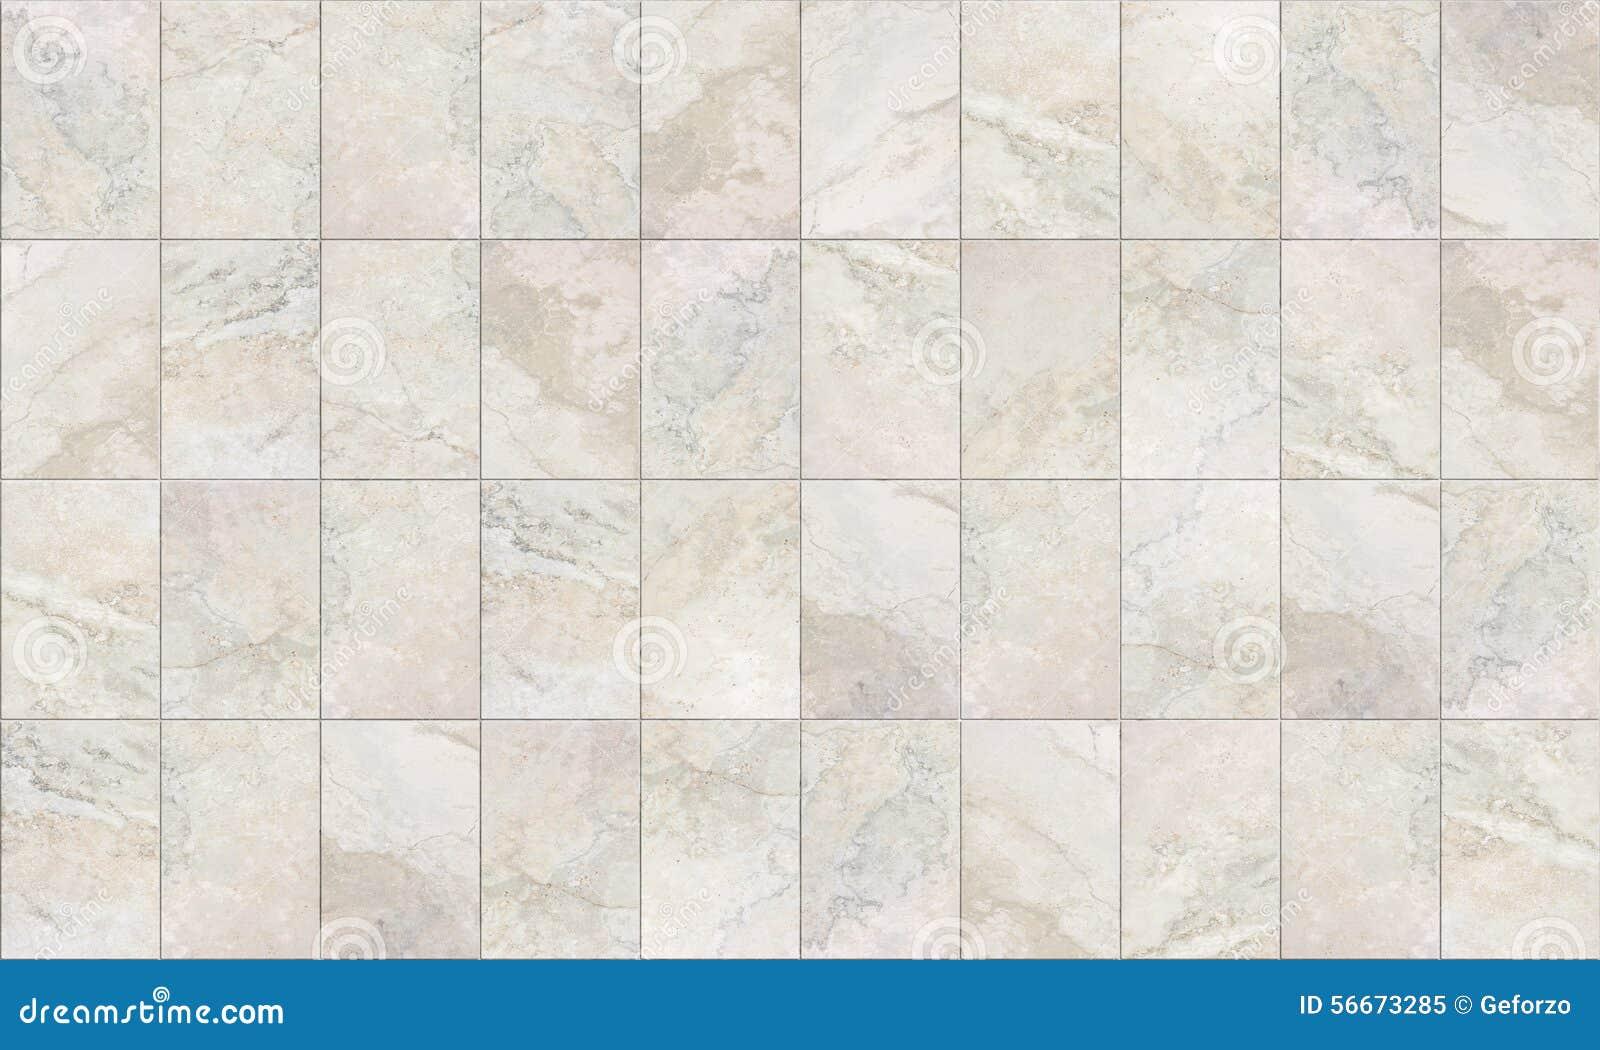 Seamless Marble Tiles Texture Stock Photo Image 56673285